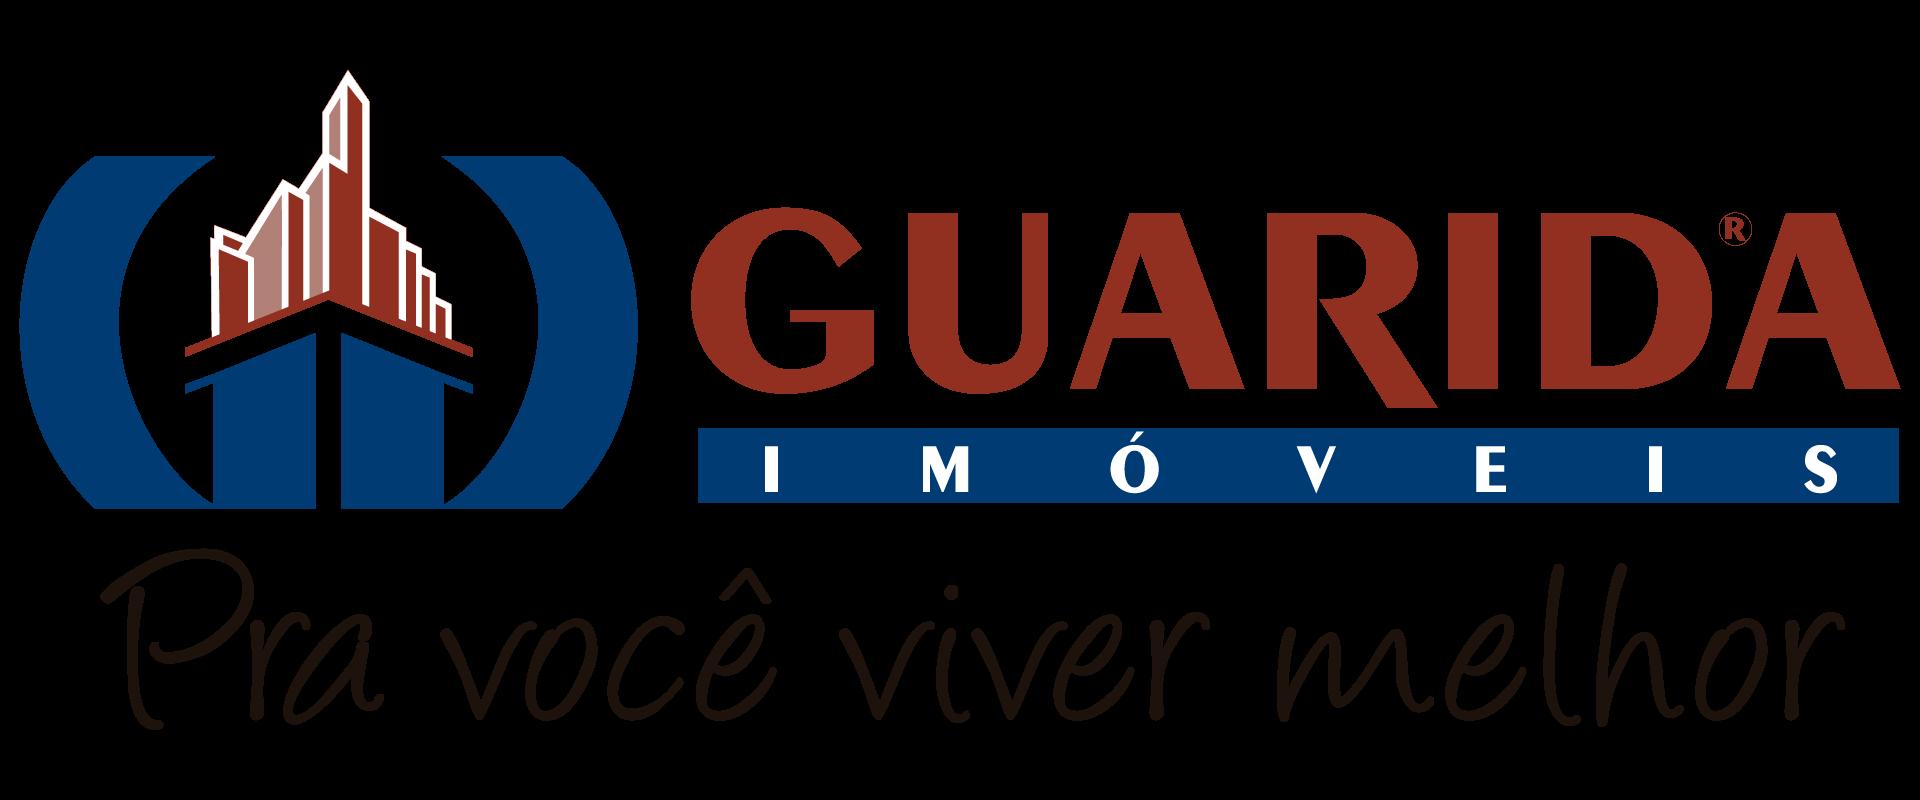 Blog da Guarida Imóveis